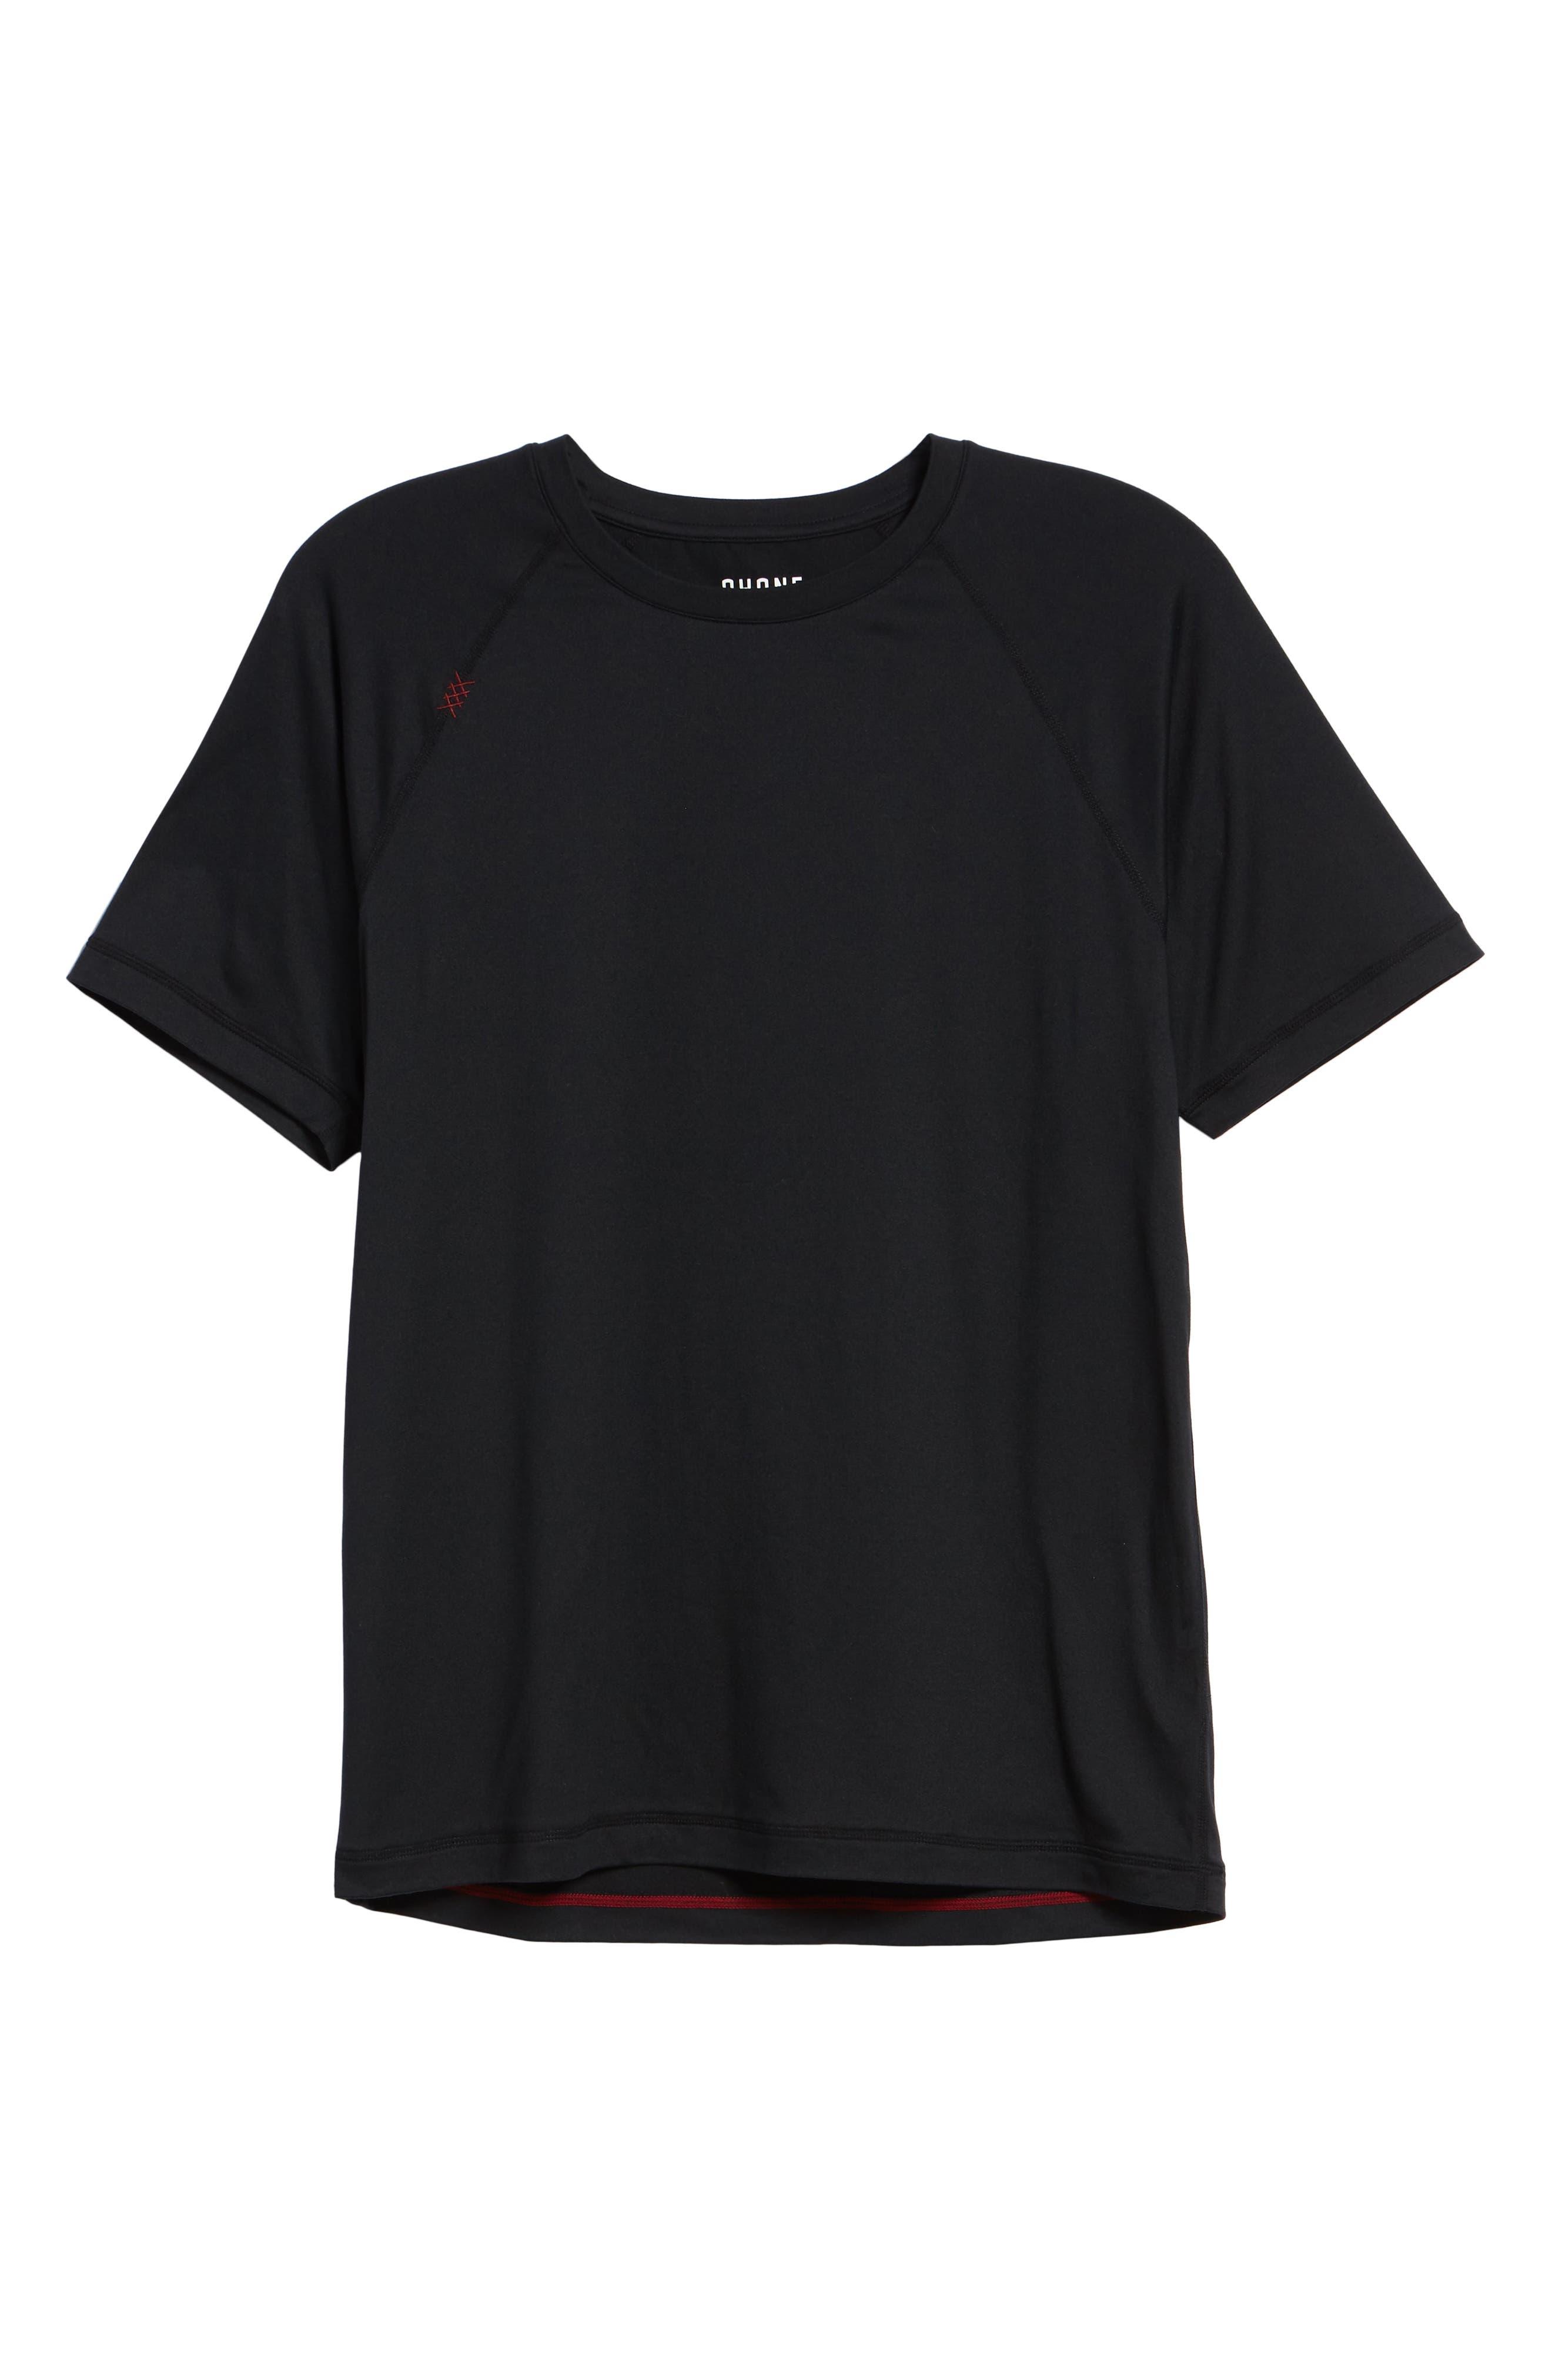 Reign Performance T-Shirt,                             Alternate thumbnail 6, color,                             BLACK